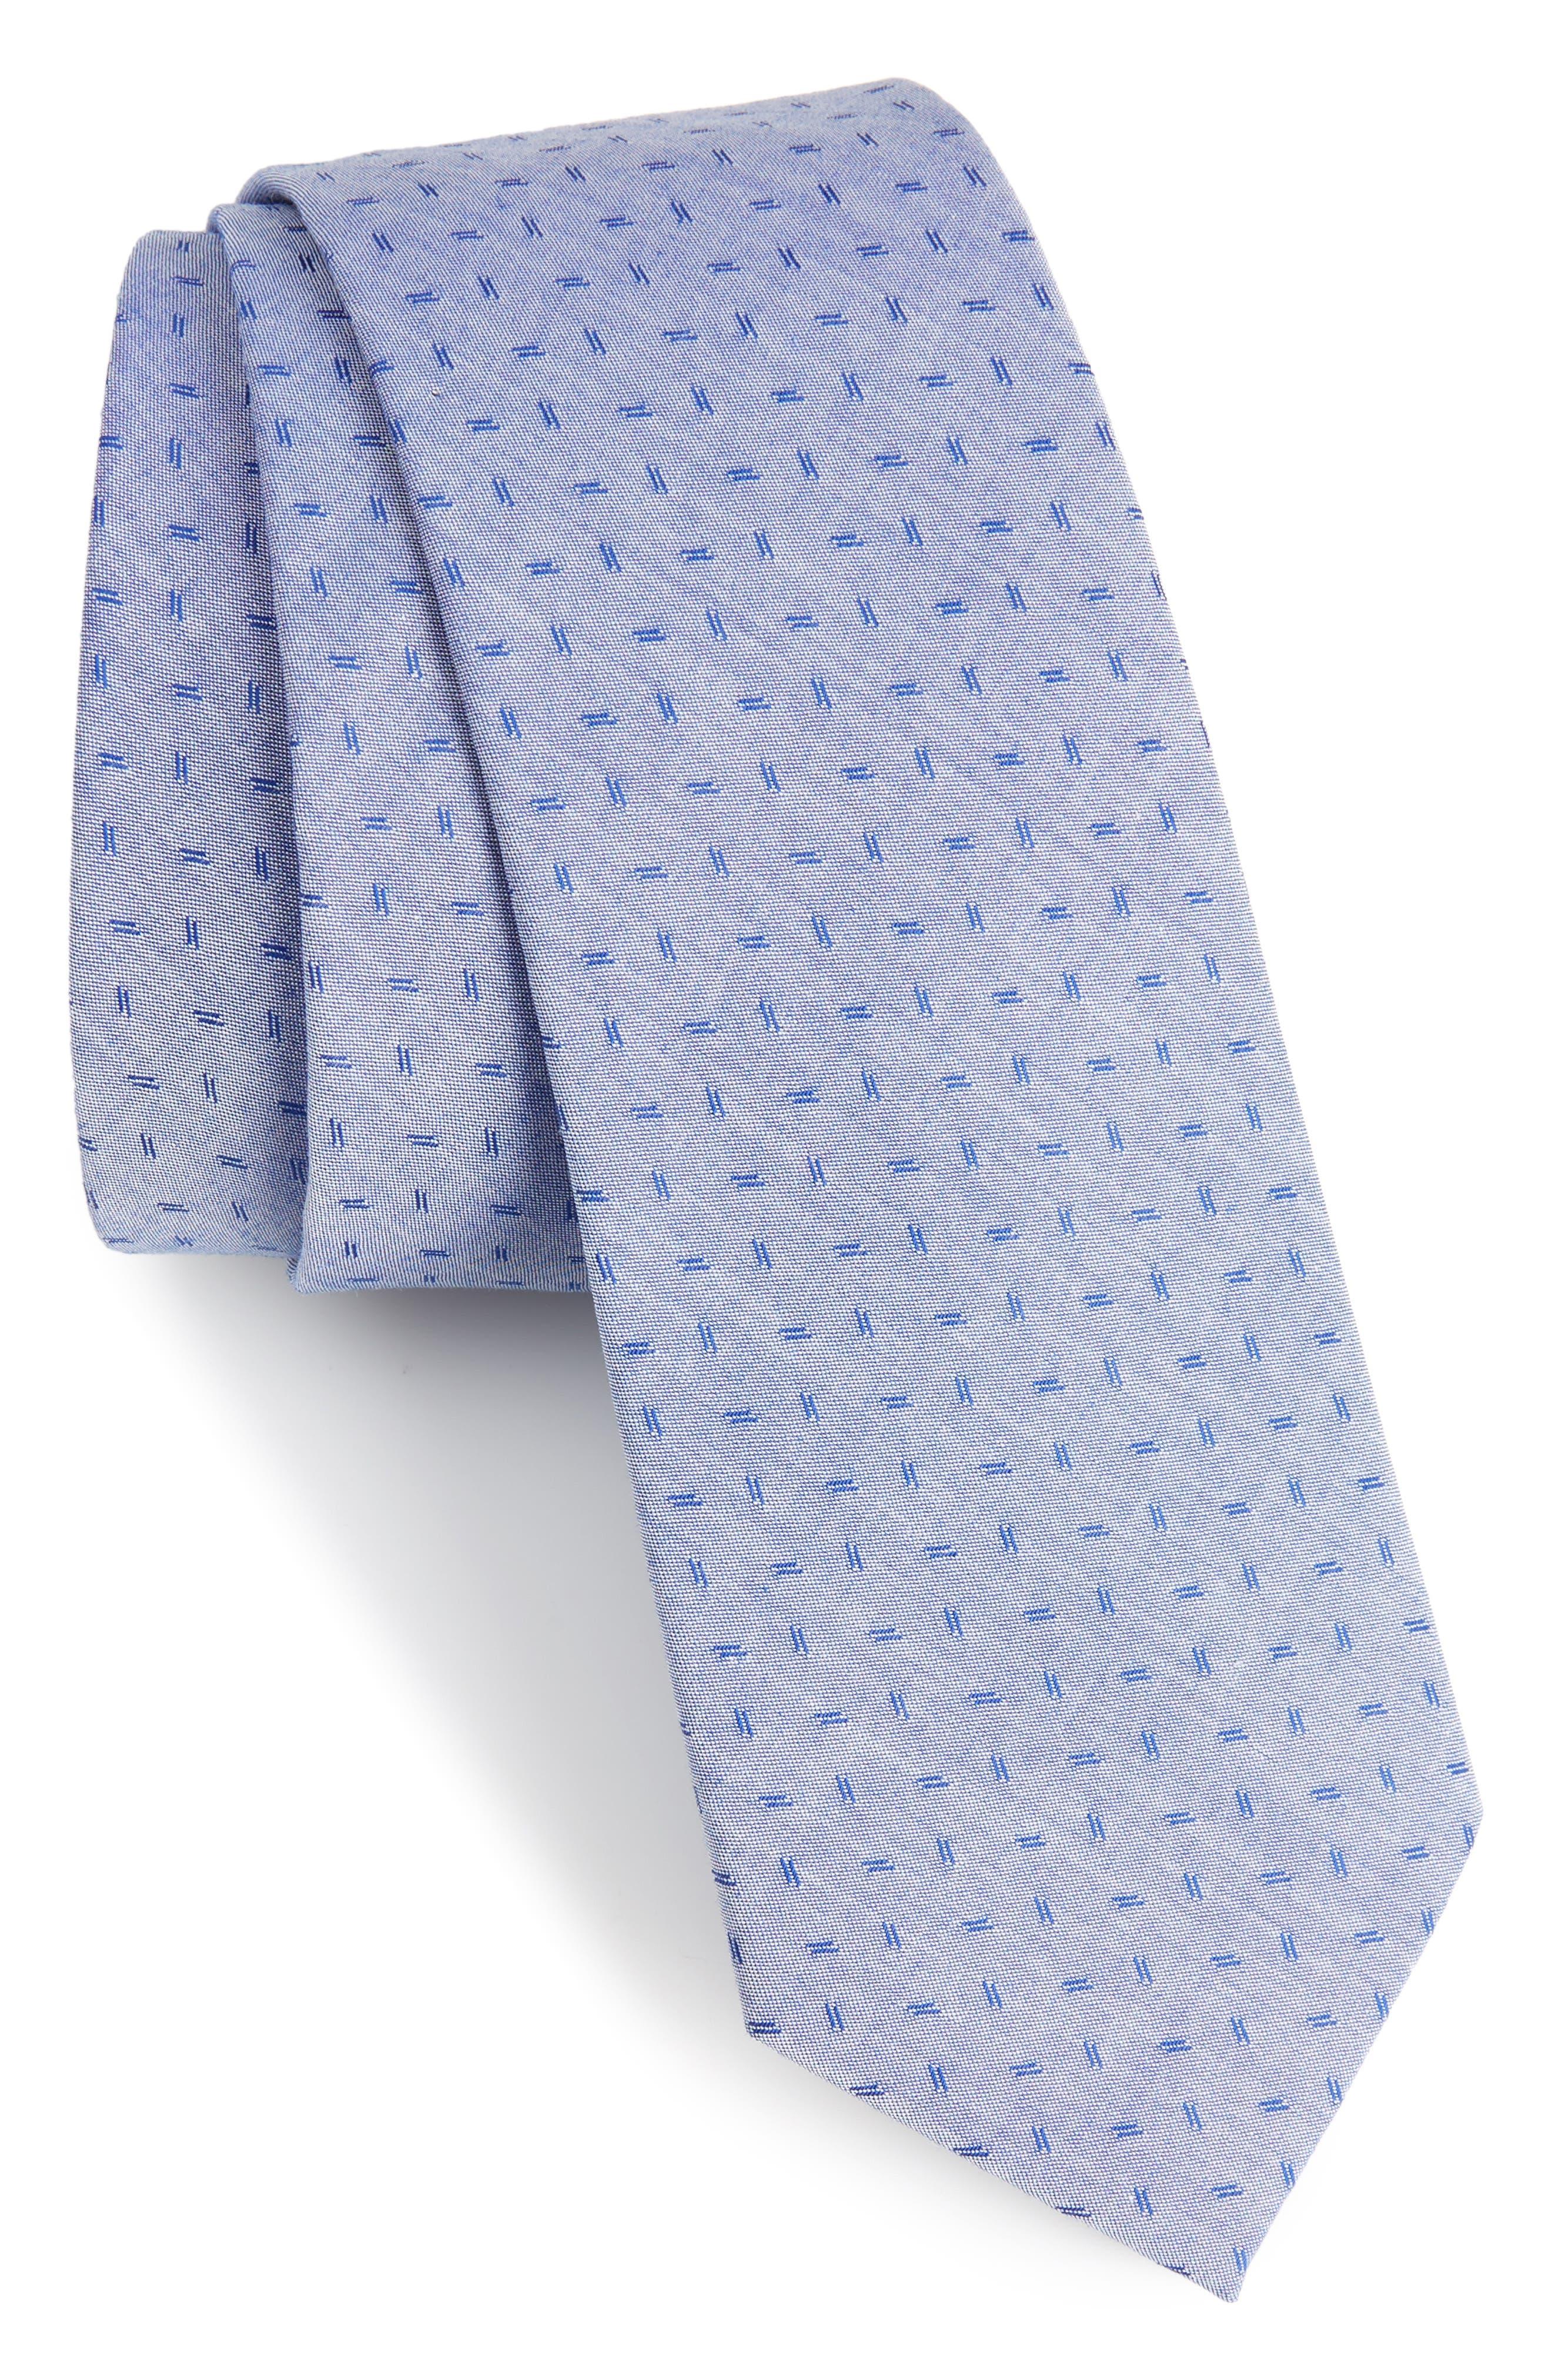 Indigo Microgrid Cotton Skinny Tie,                             Main thumbnail 1, color,                             Blue